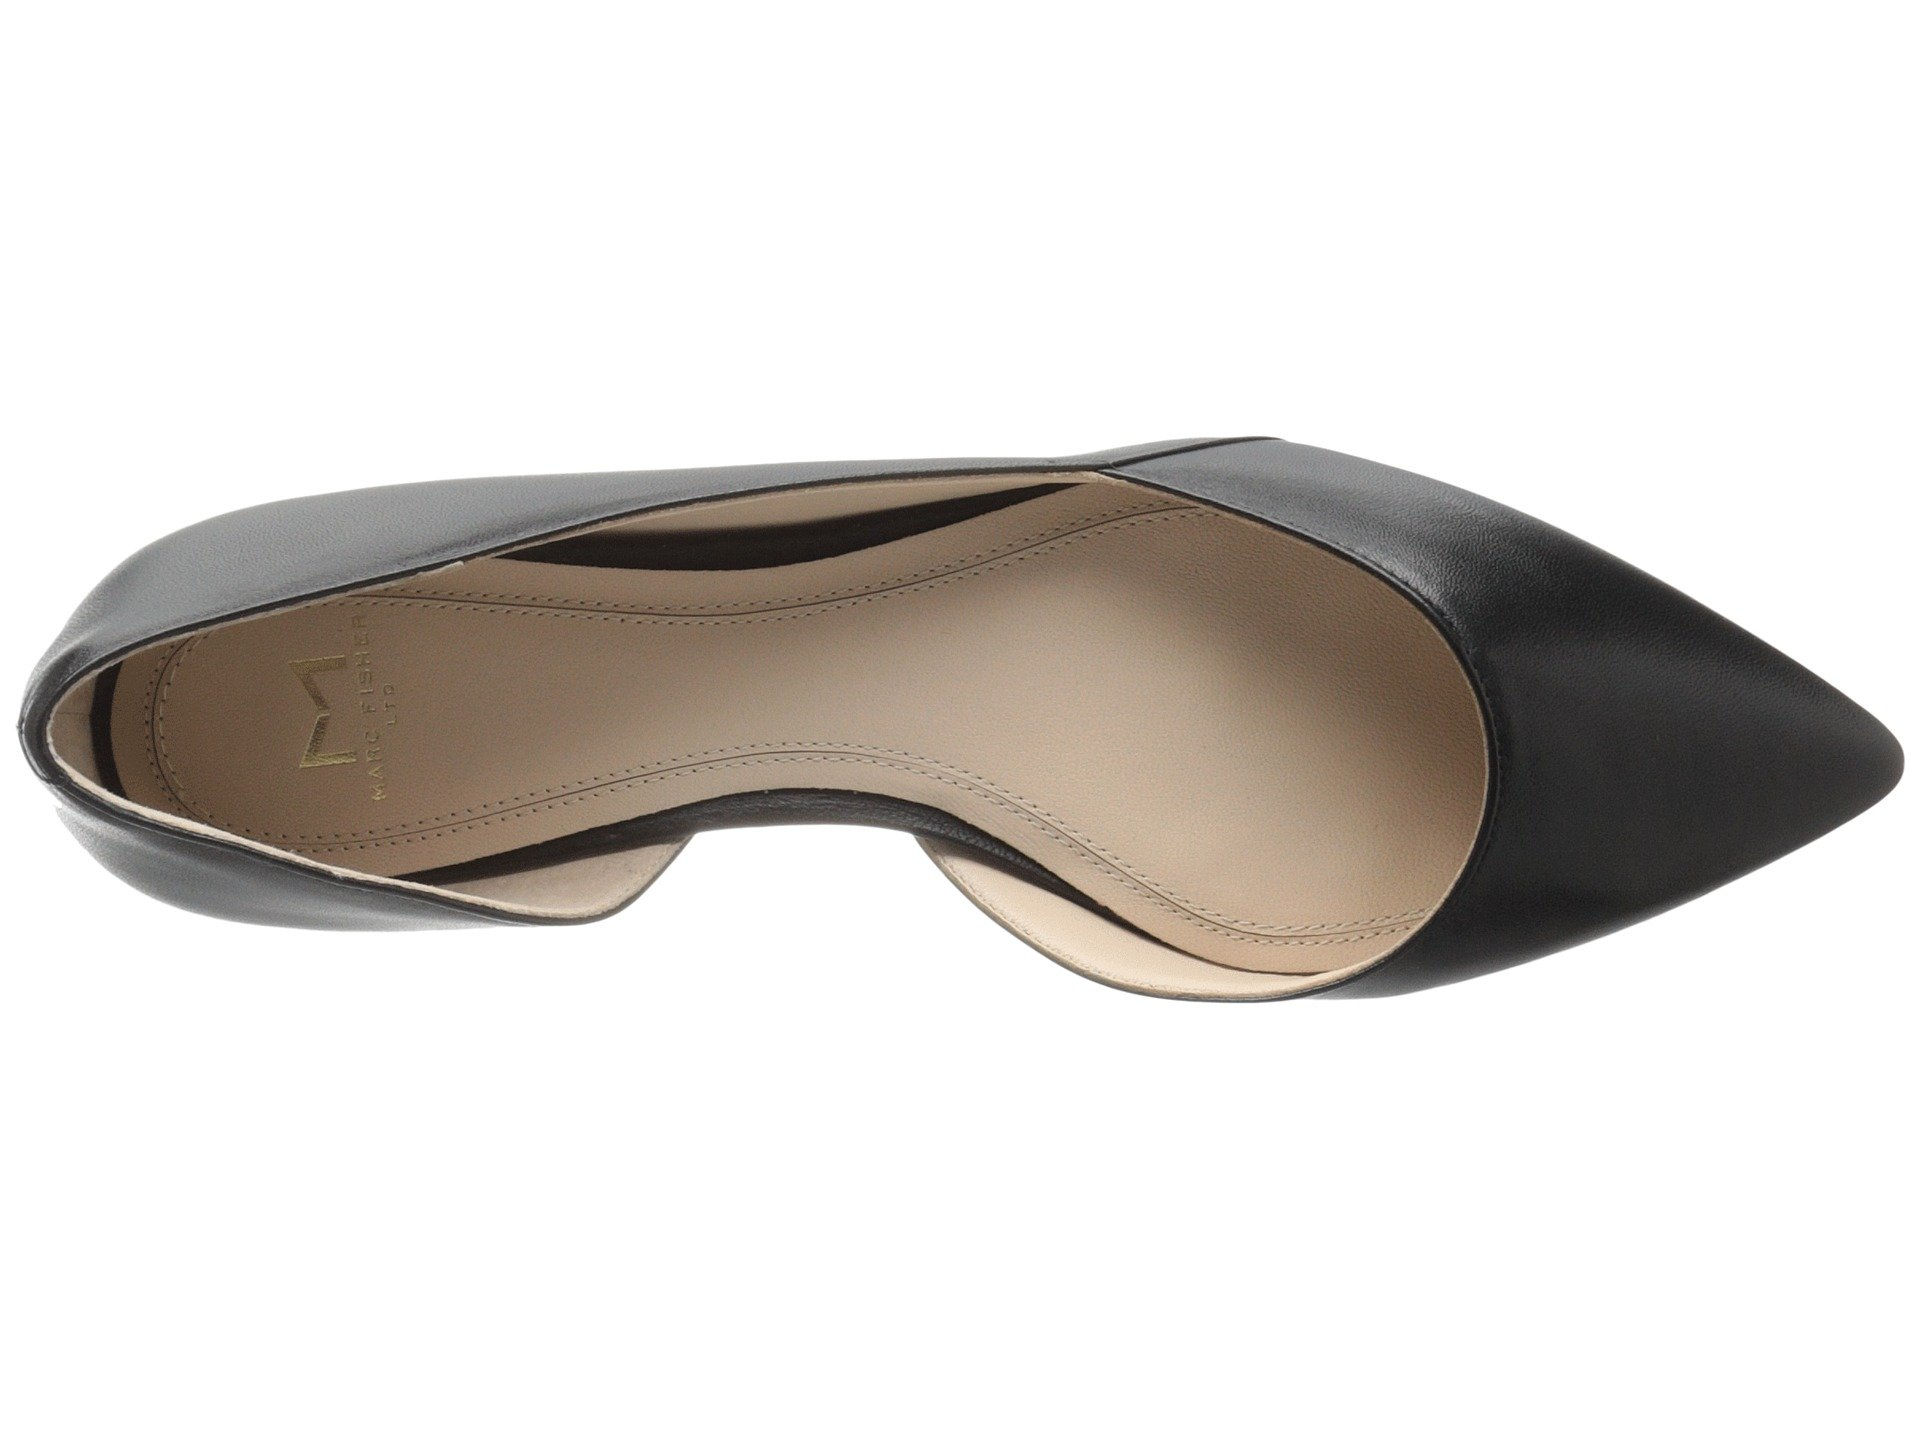 Ltd D'orsay Sunny Flat Black Marc Leather Fisher gqpwagO